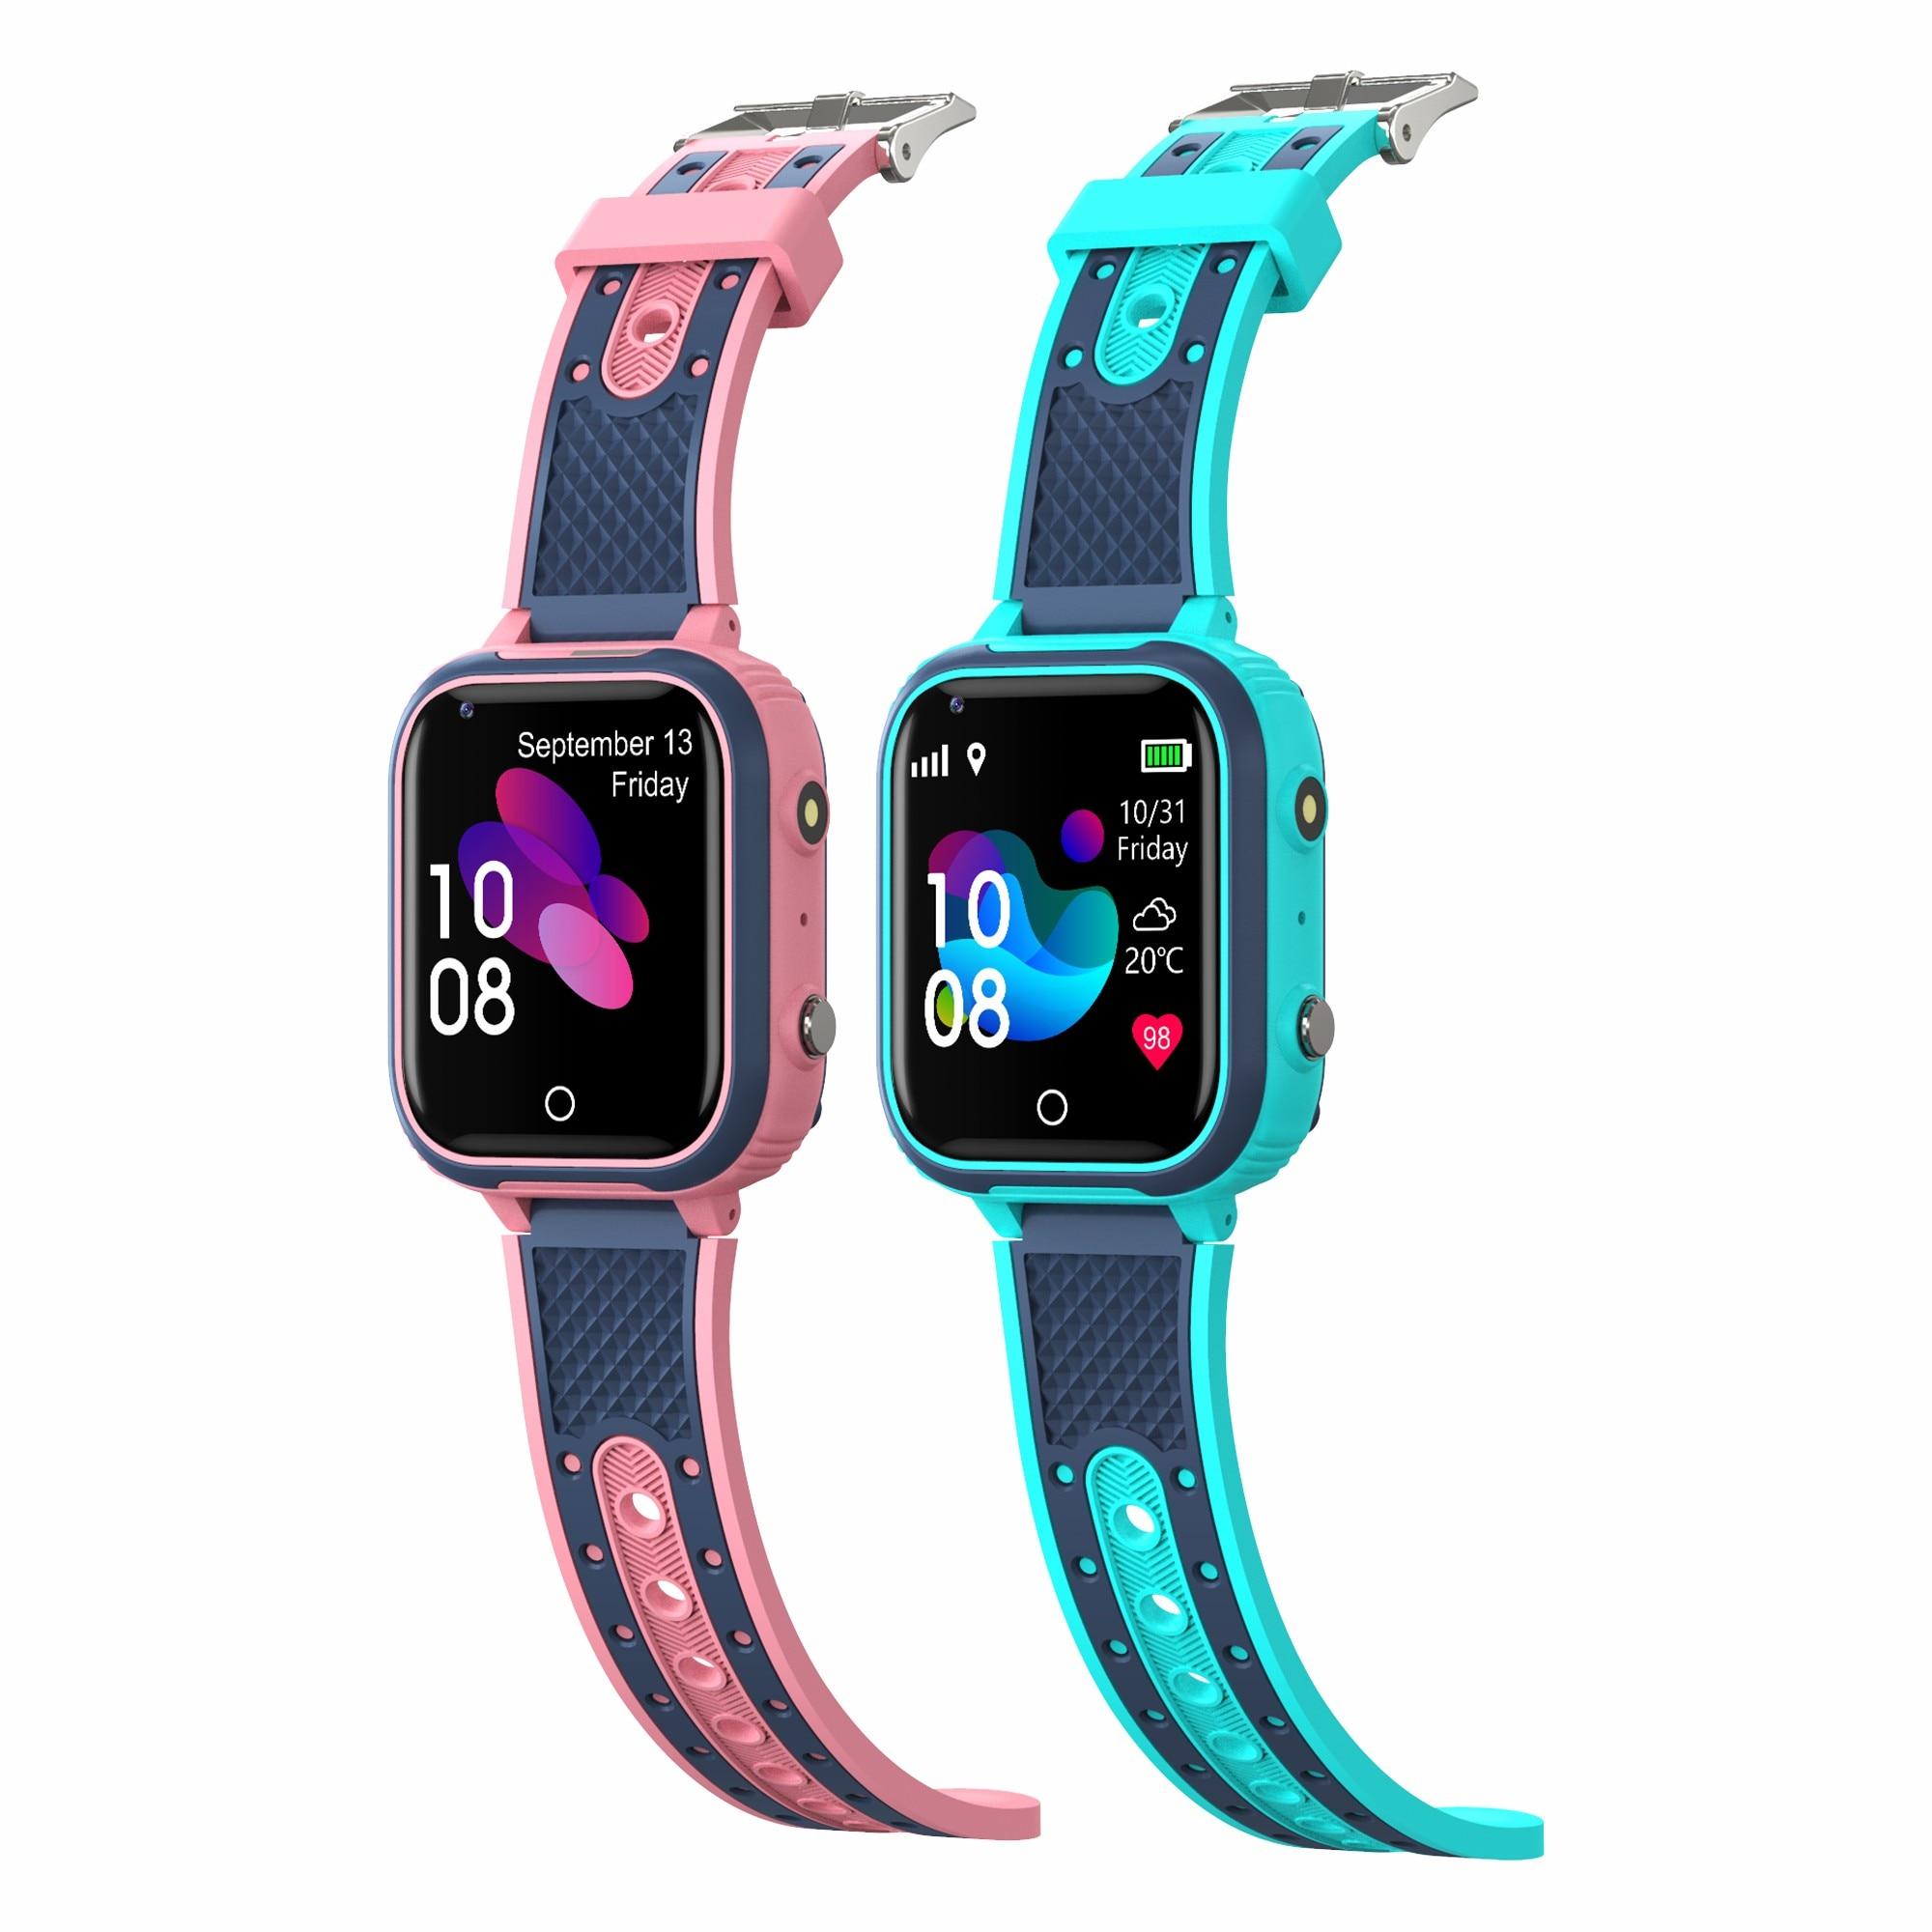 Hc93bbc18f5e74686bfea779338de61edG LT21 4G Smart Watch Kids GPS WIFI Video Call SOS IP67 Waterproof Child Smartwatch Camera Monitor Tracker Location Phone Watch